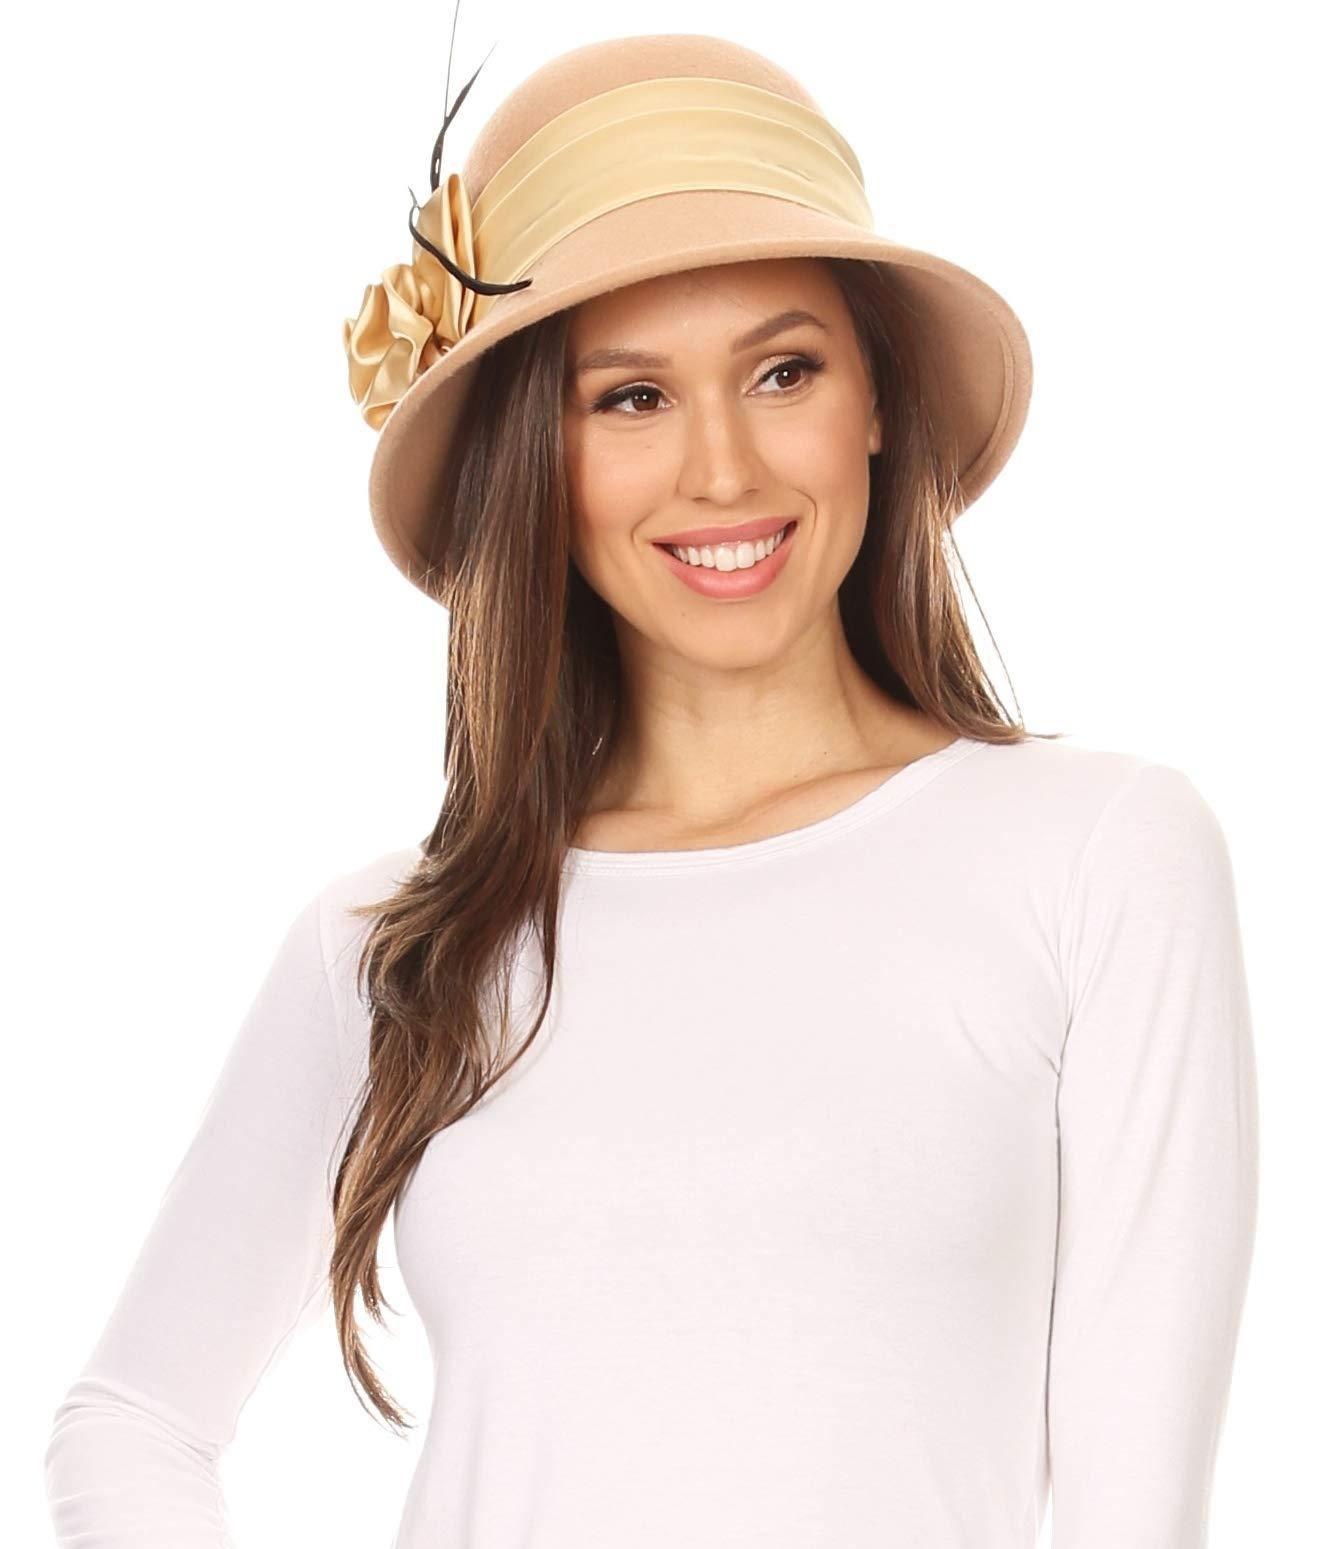 Sakkas 30041M Danielle Vintage Style Wool Cloche Hat - Beige - One Size